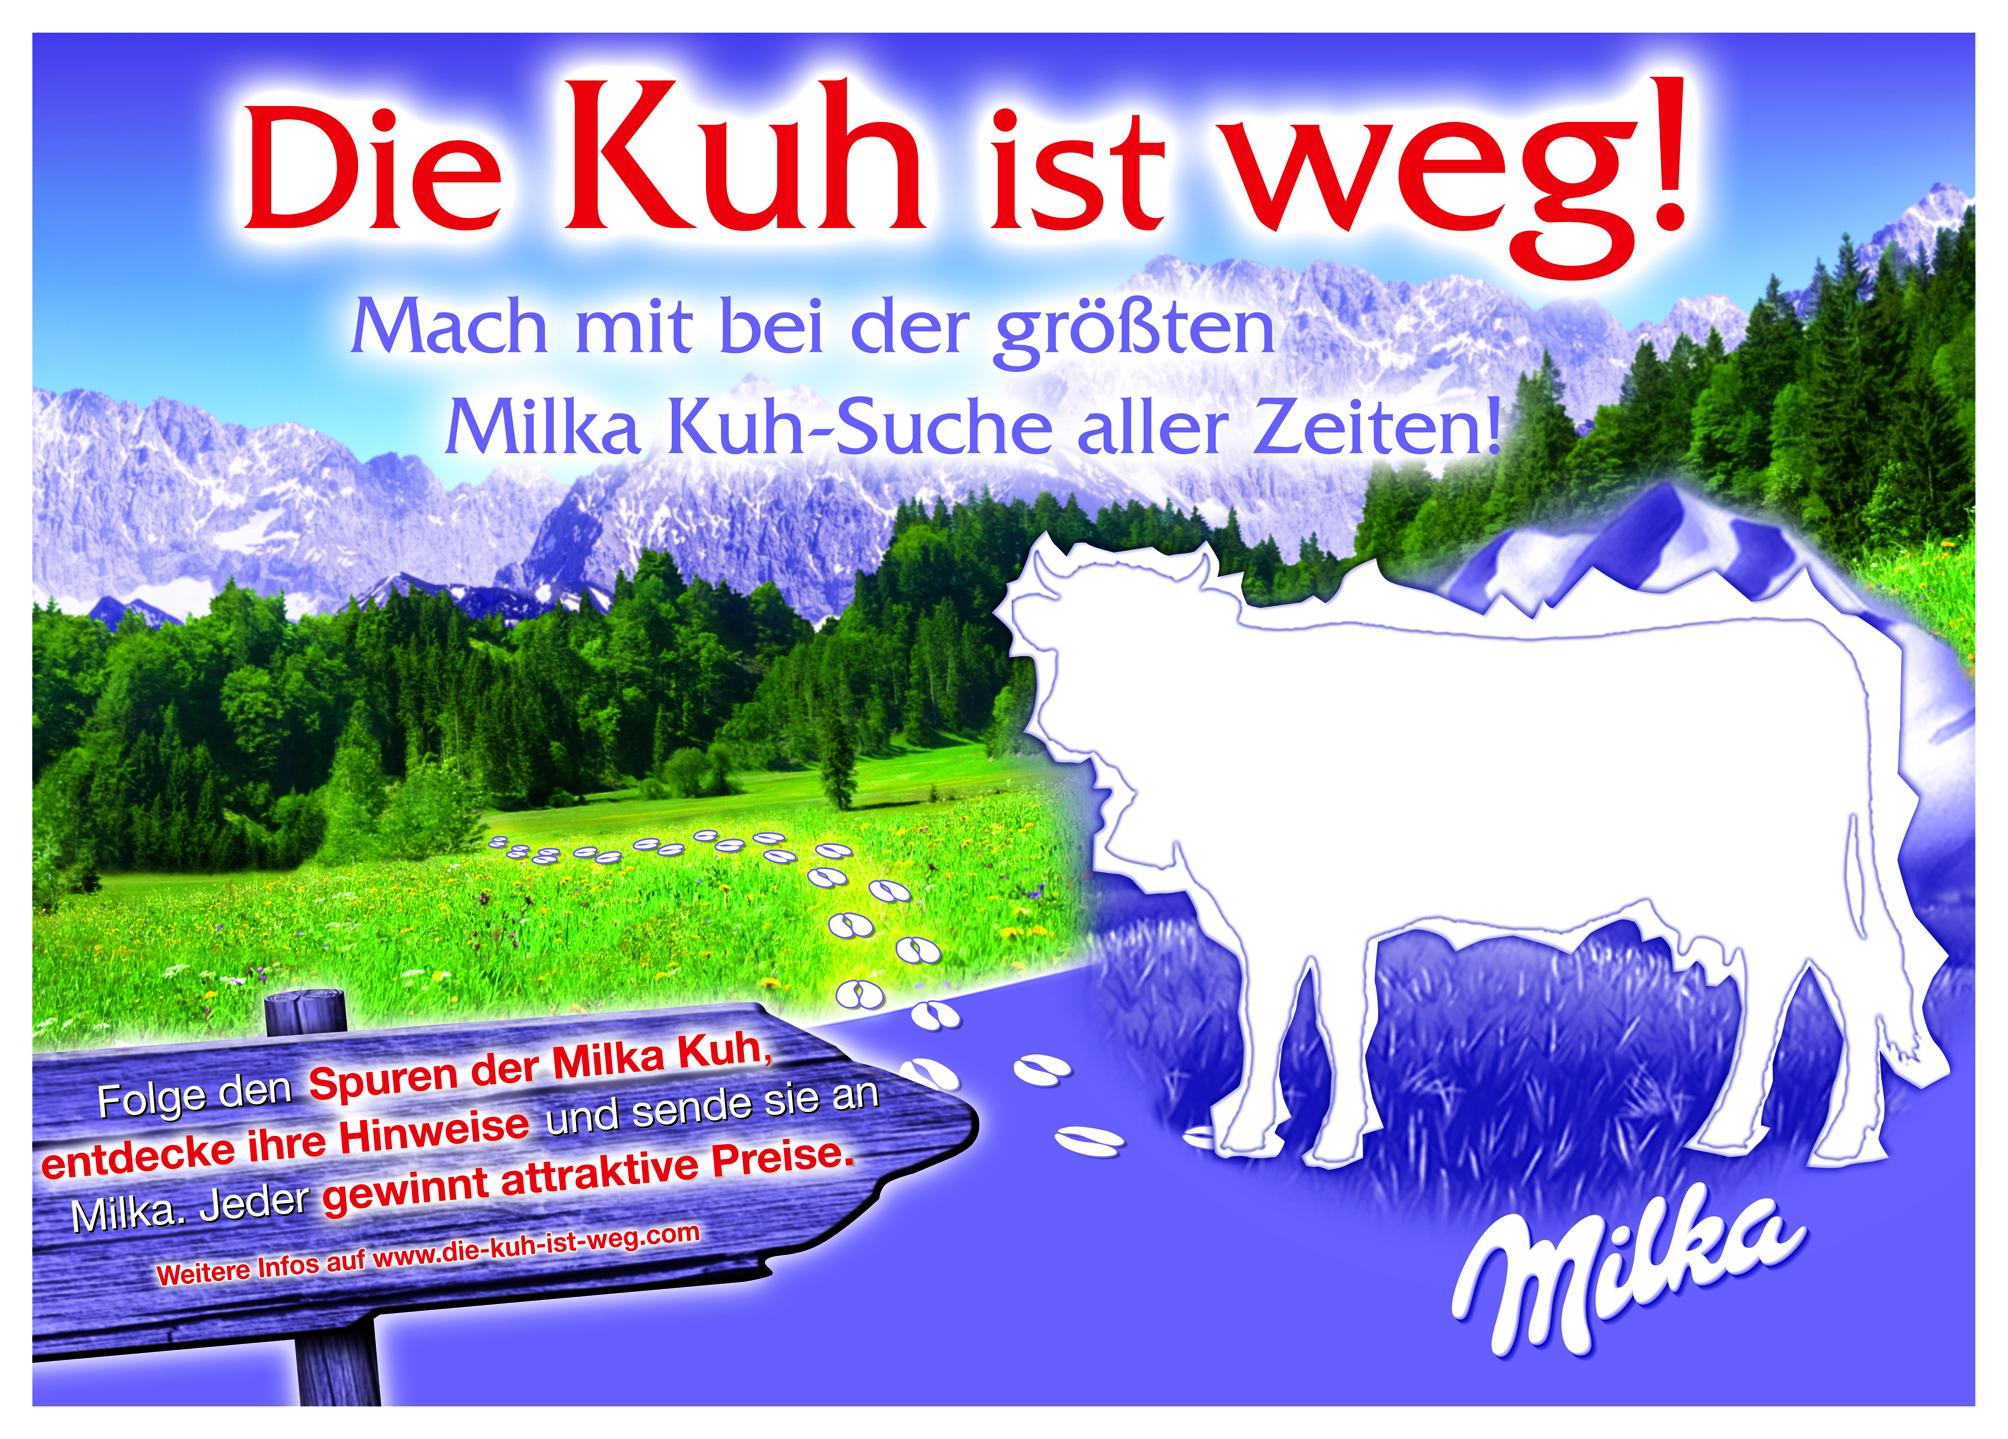 Milka - Aktion die Kuh ist weg